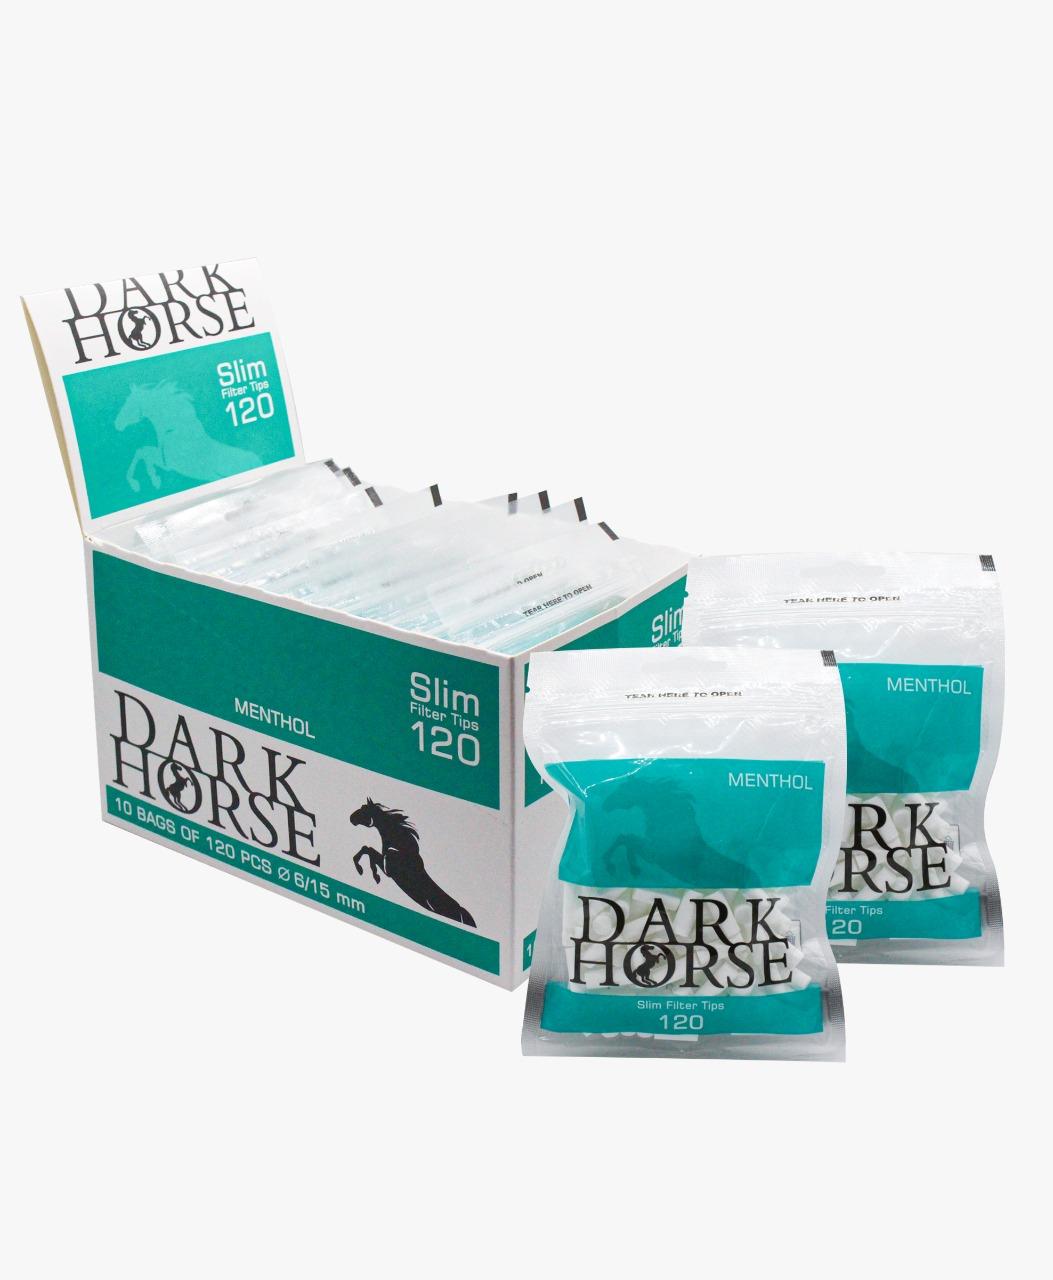 FILTRO ENROLAR DARK HORSE MENTHOL SLIM 6X15MM